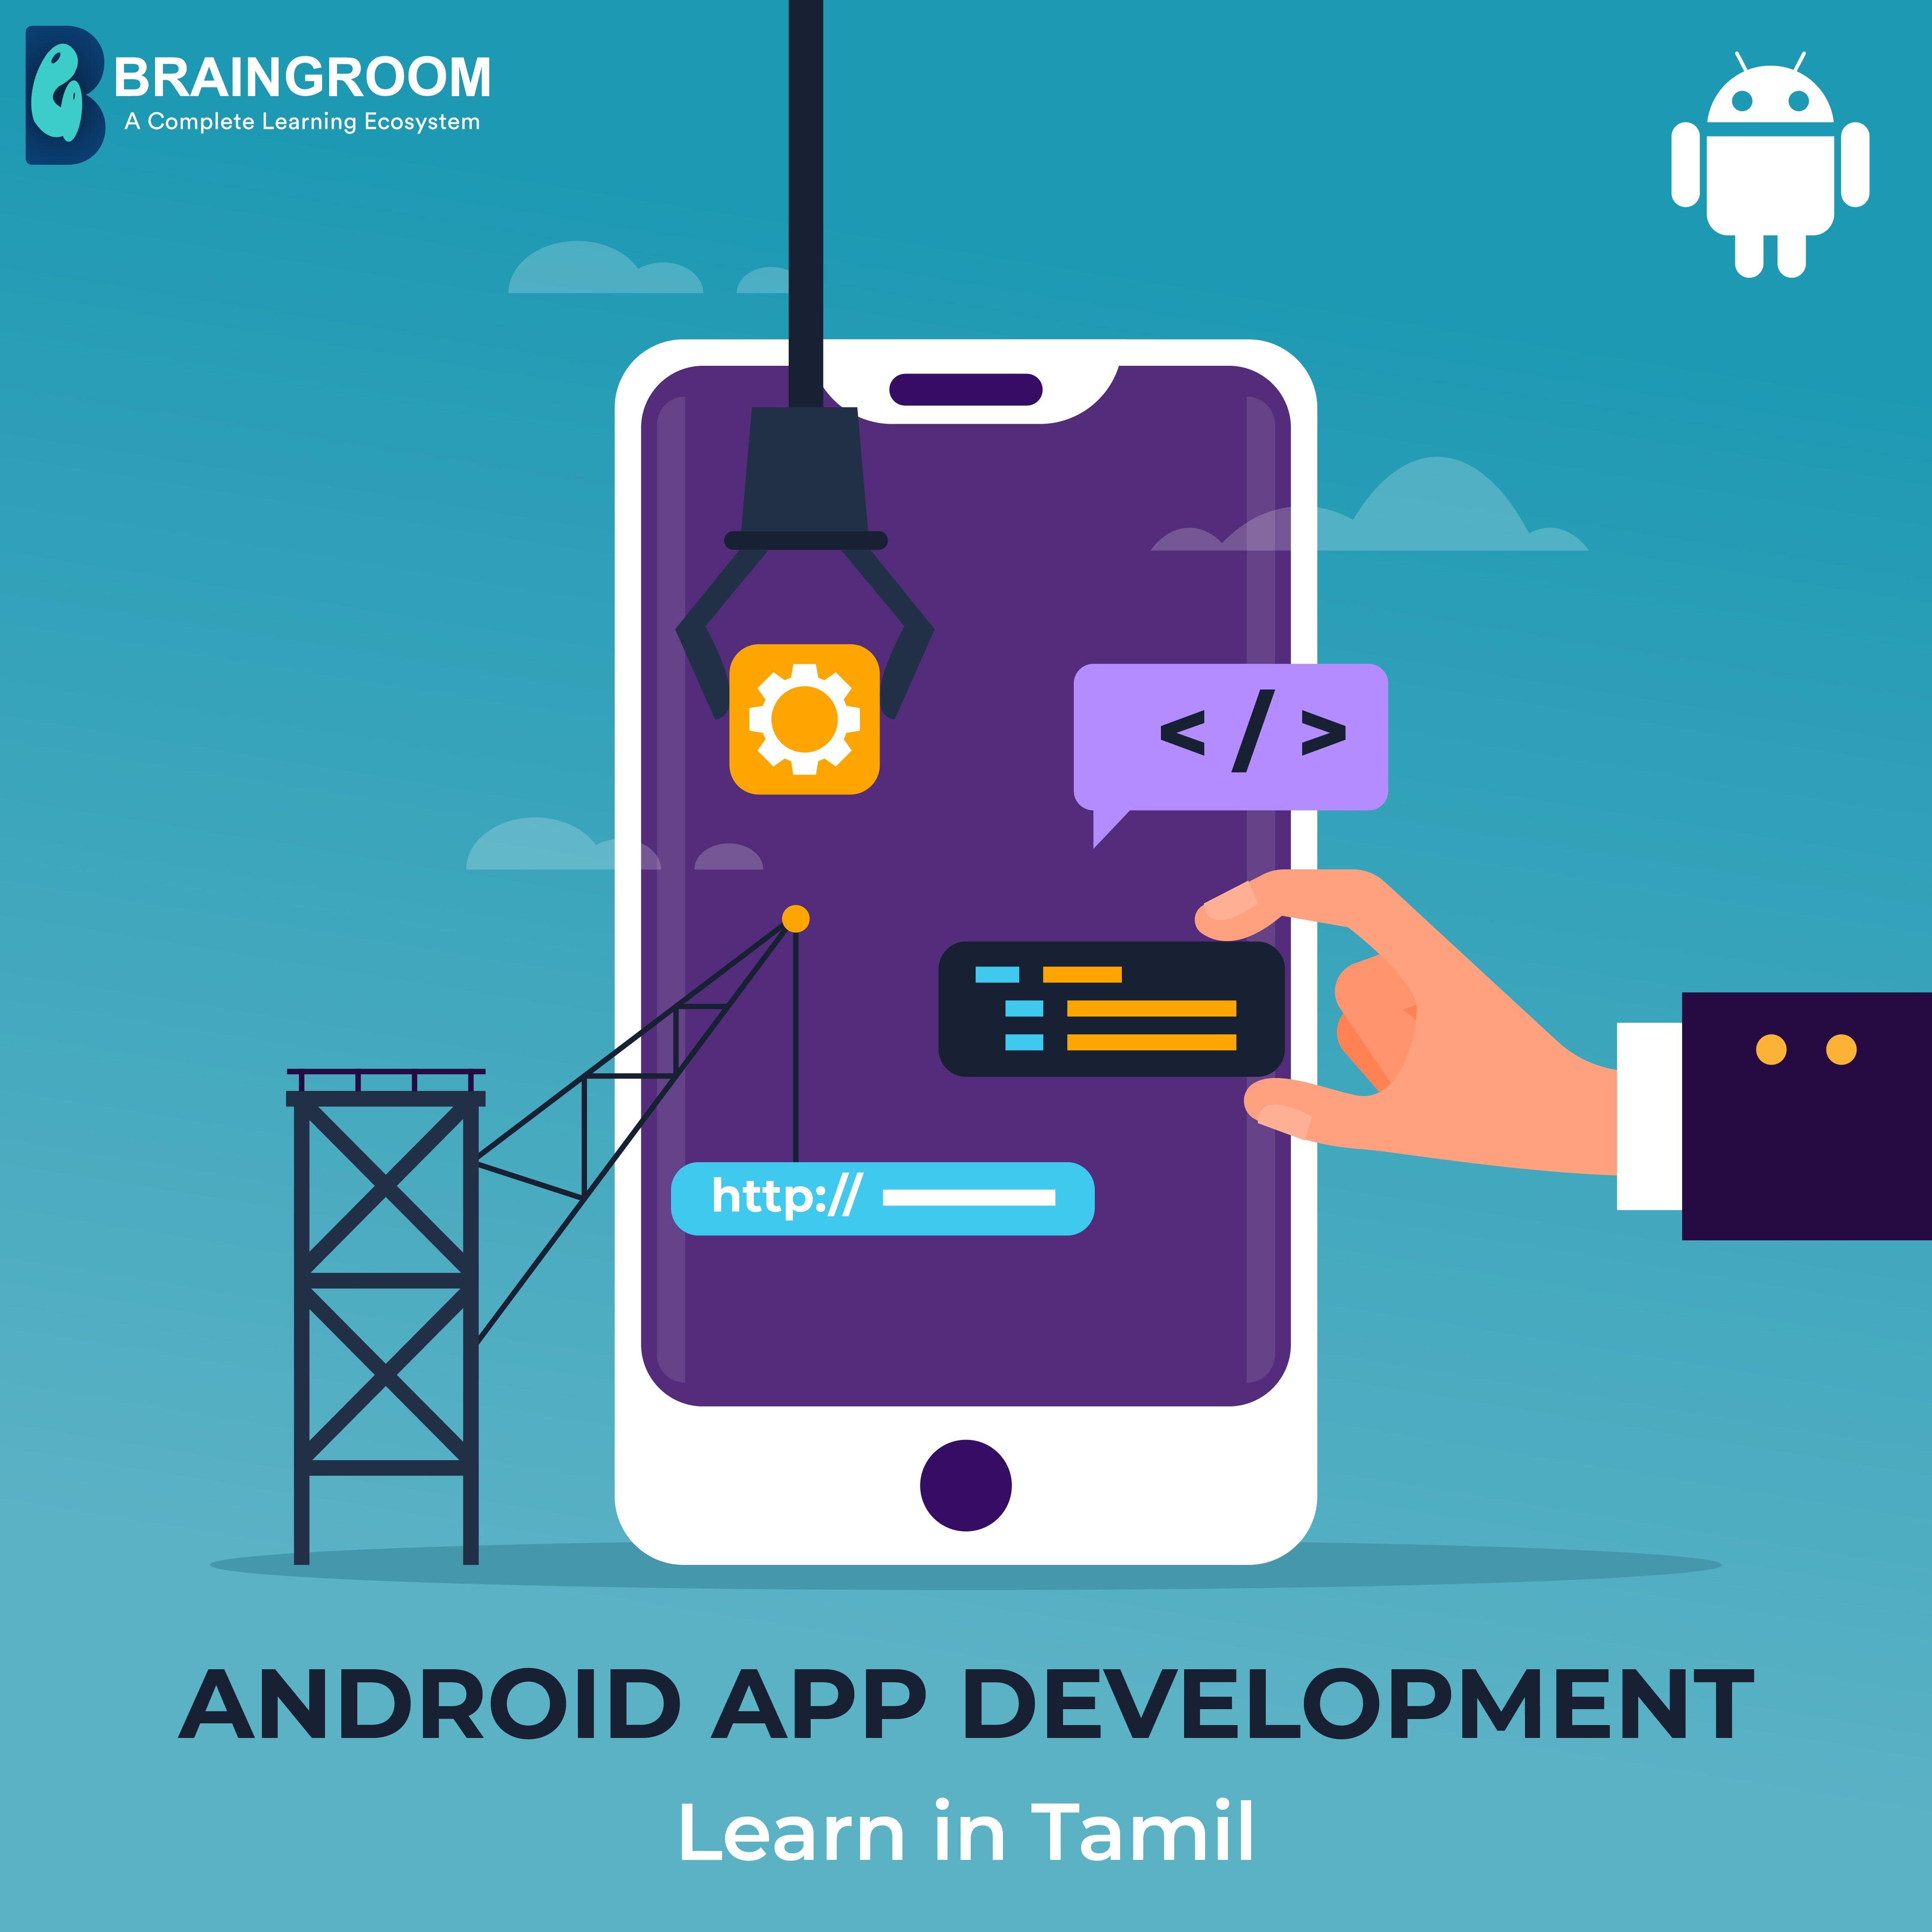 Android App Development 2 weeks FREE online training